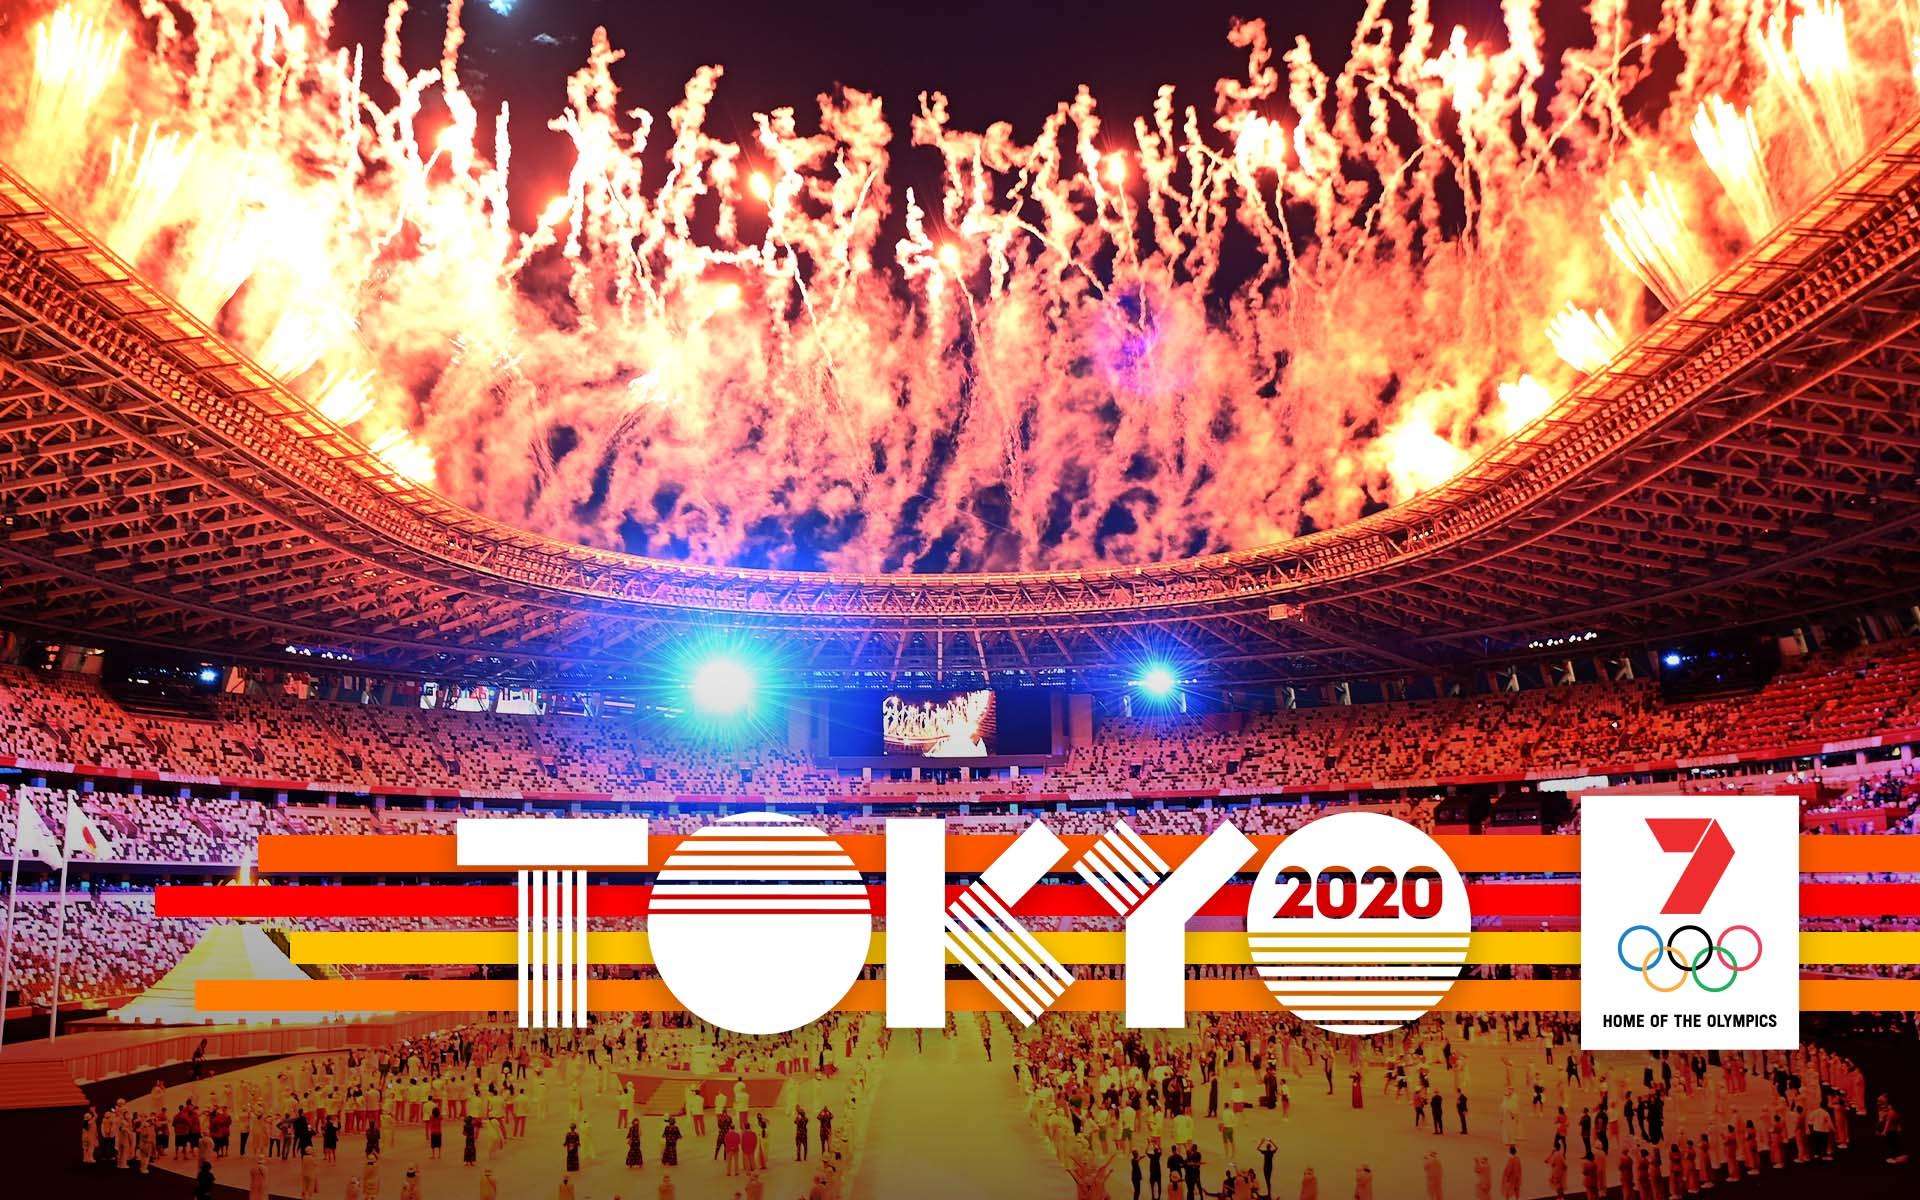 Olympic glory: Tokyo 2020 makes history